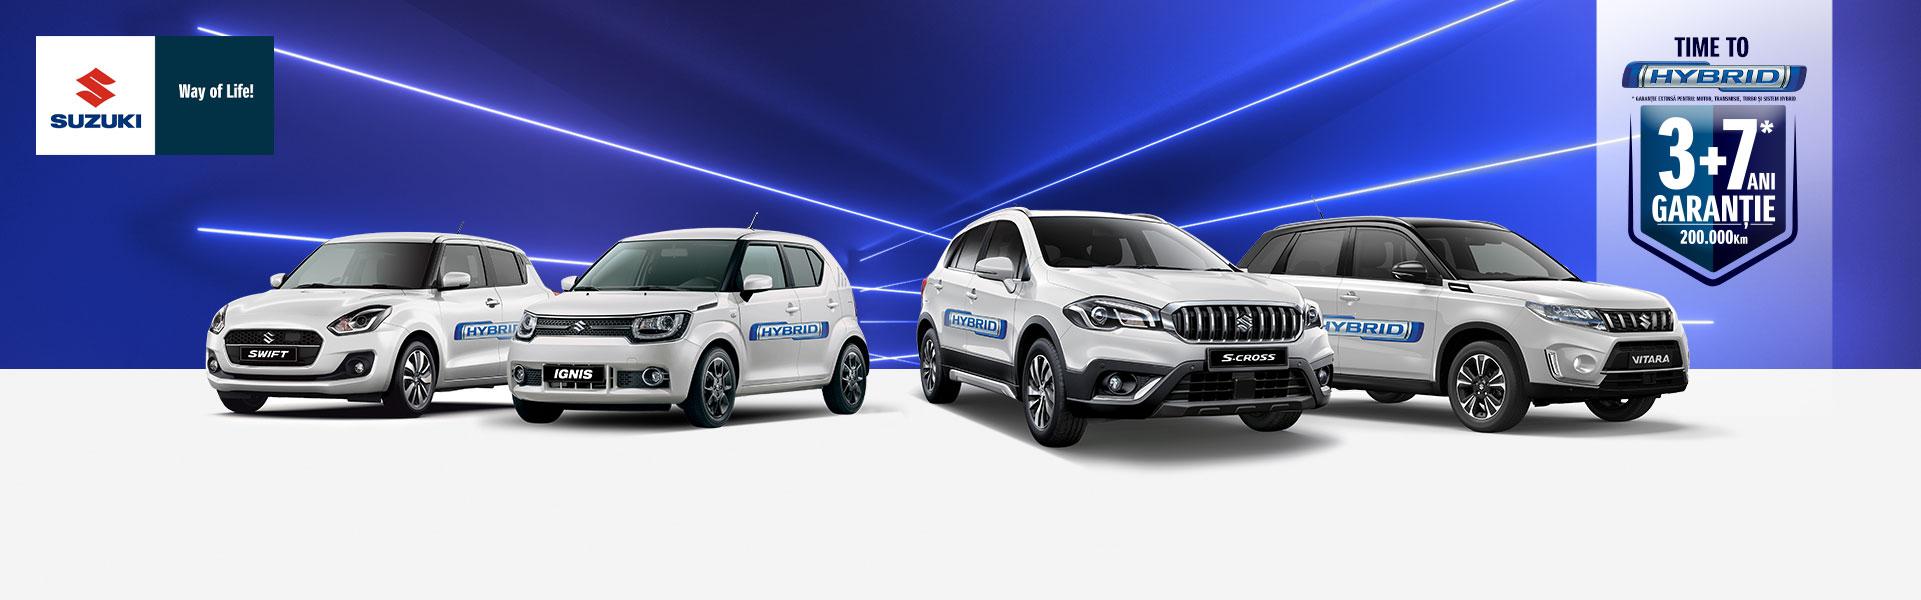 (P) Suzuki își extinde gama de modele hibrid si devine primul producator care comercializeaza doar modele hibrid 12V si 48V. Time to Hybrid!